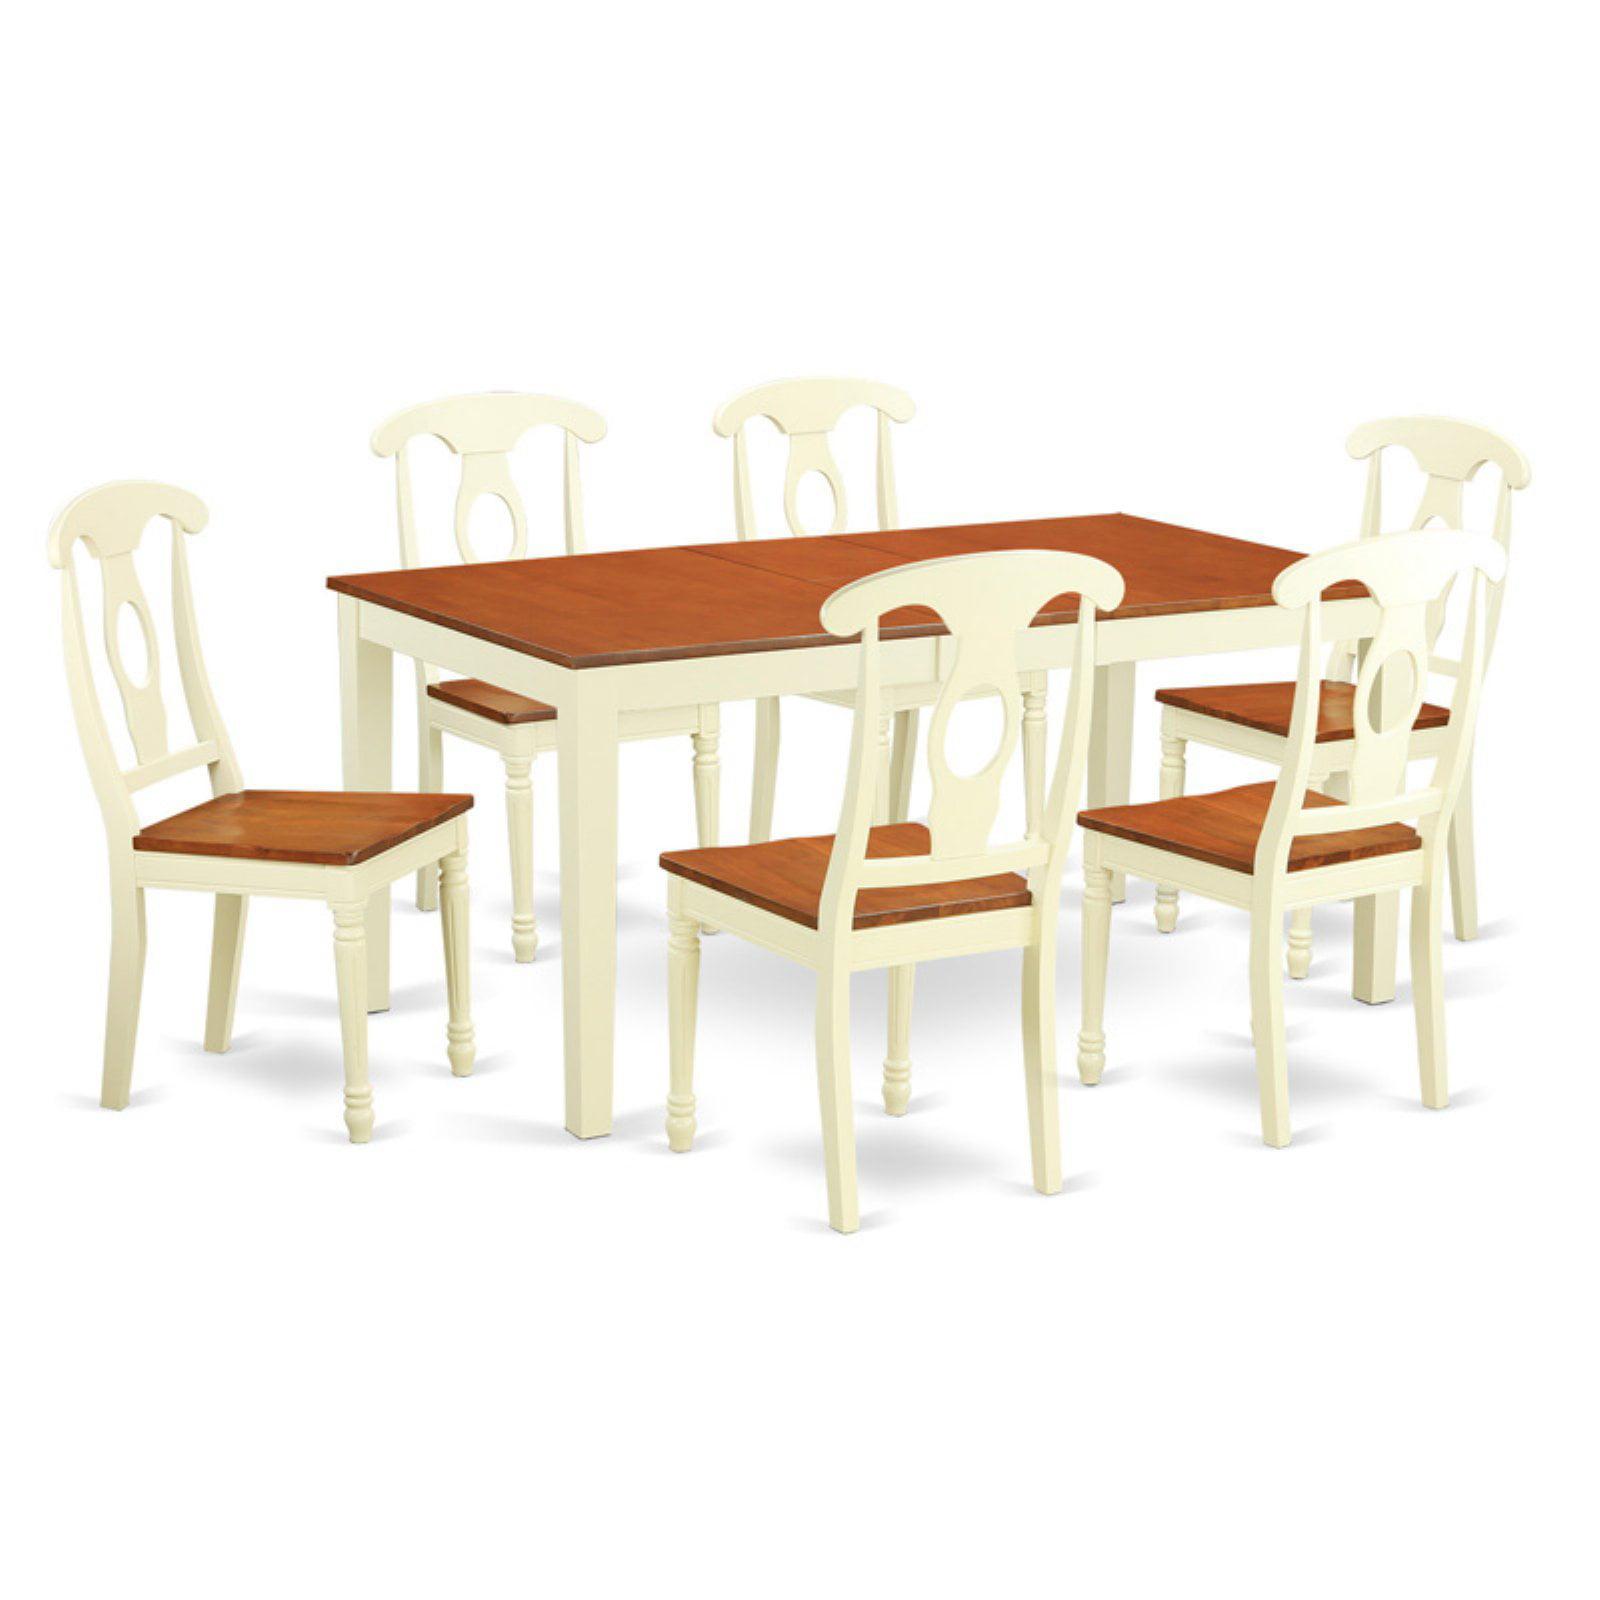 East West Nicoli 6 Piece Dining Set: East West Furniture Nicoli 7 Piece Keyhole Dining Table